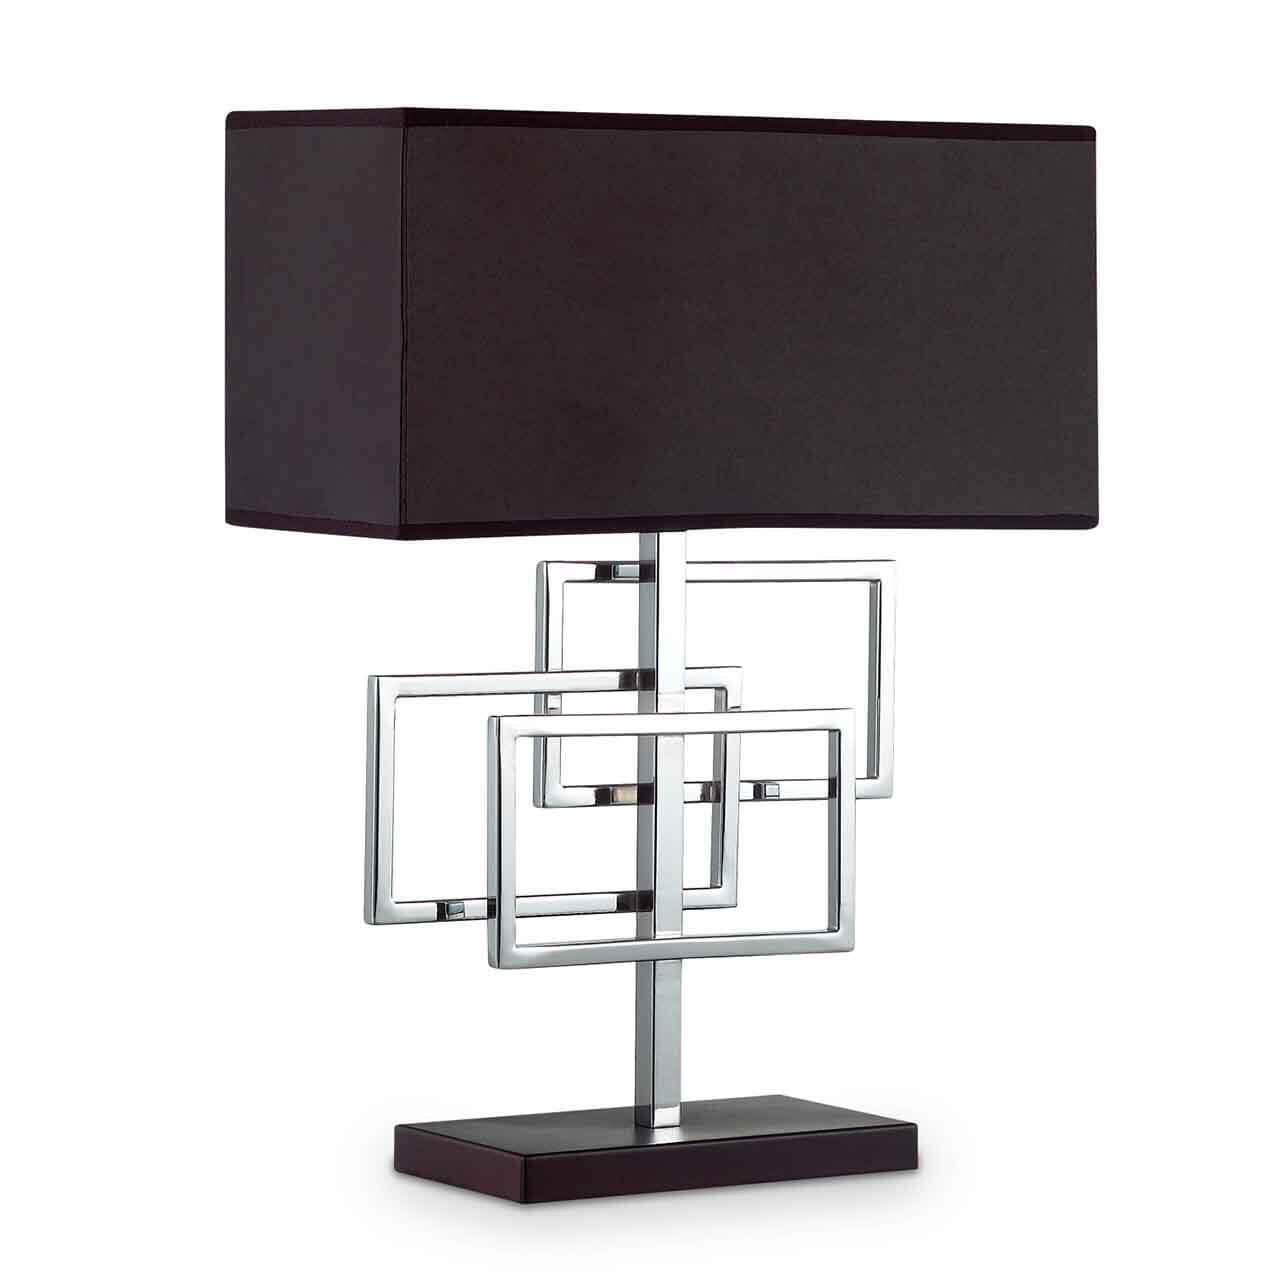 Настольная лампа Ideal Lux Luxury Tl1 Cromo недорого